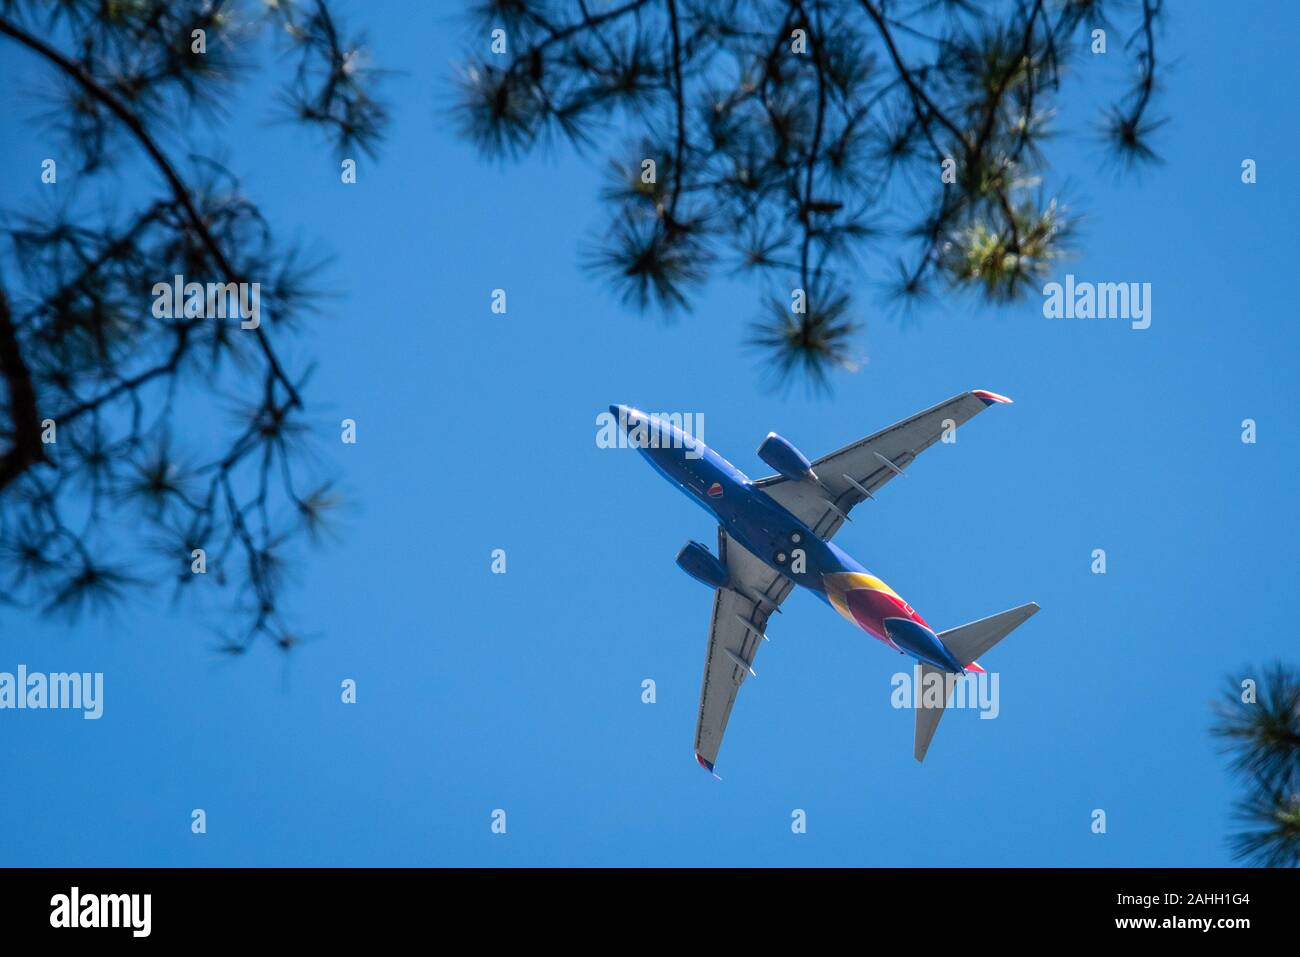 Southwest Airlines passenger jet on approach to Hartfield-Jackson Atlanta International Airport in Atlanta, Georgia. (USA) Stock Photo